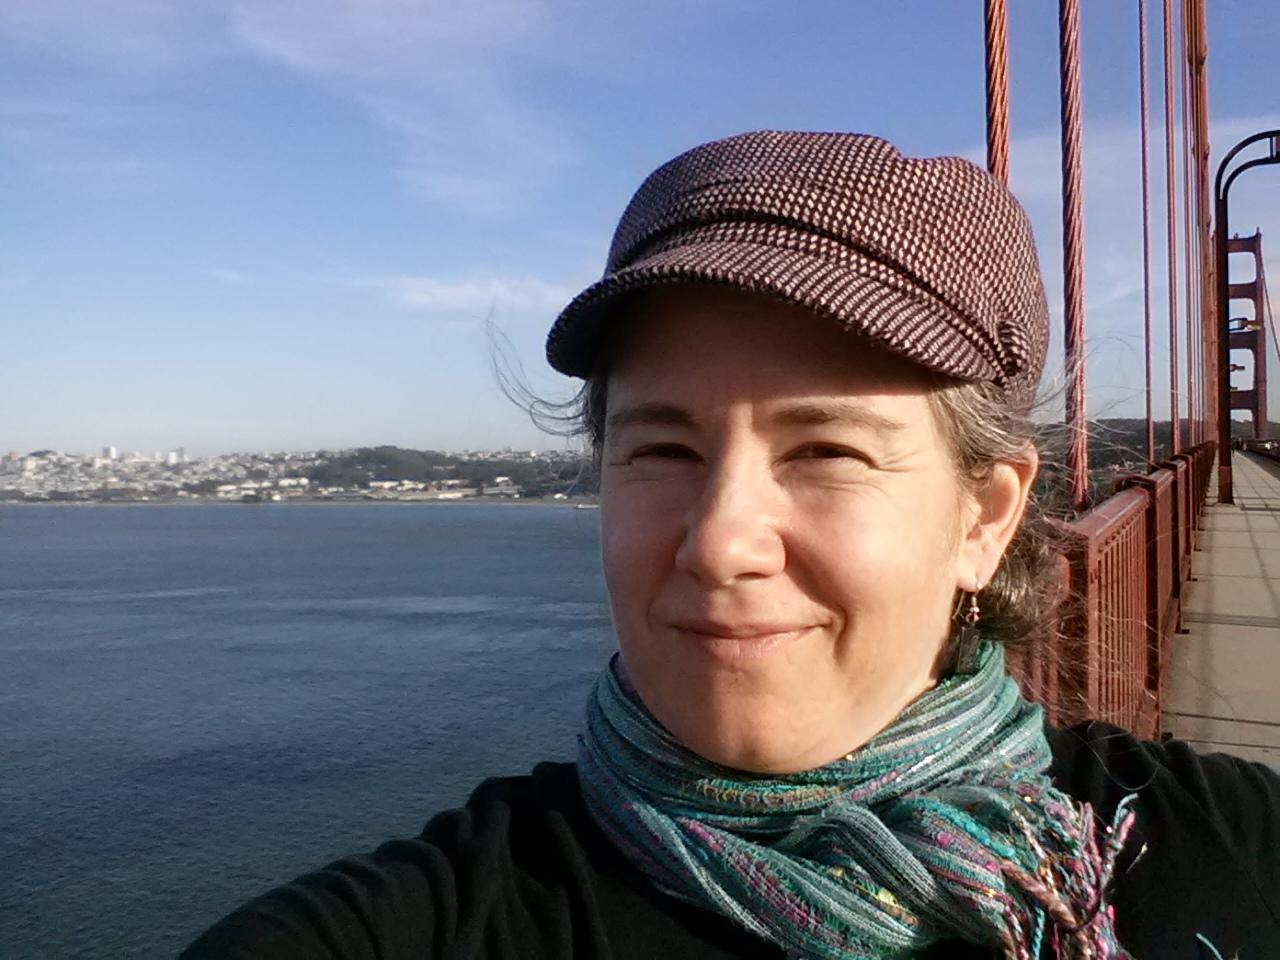 Janice Habarth, Ph.D., Principle Investigator